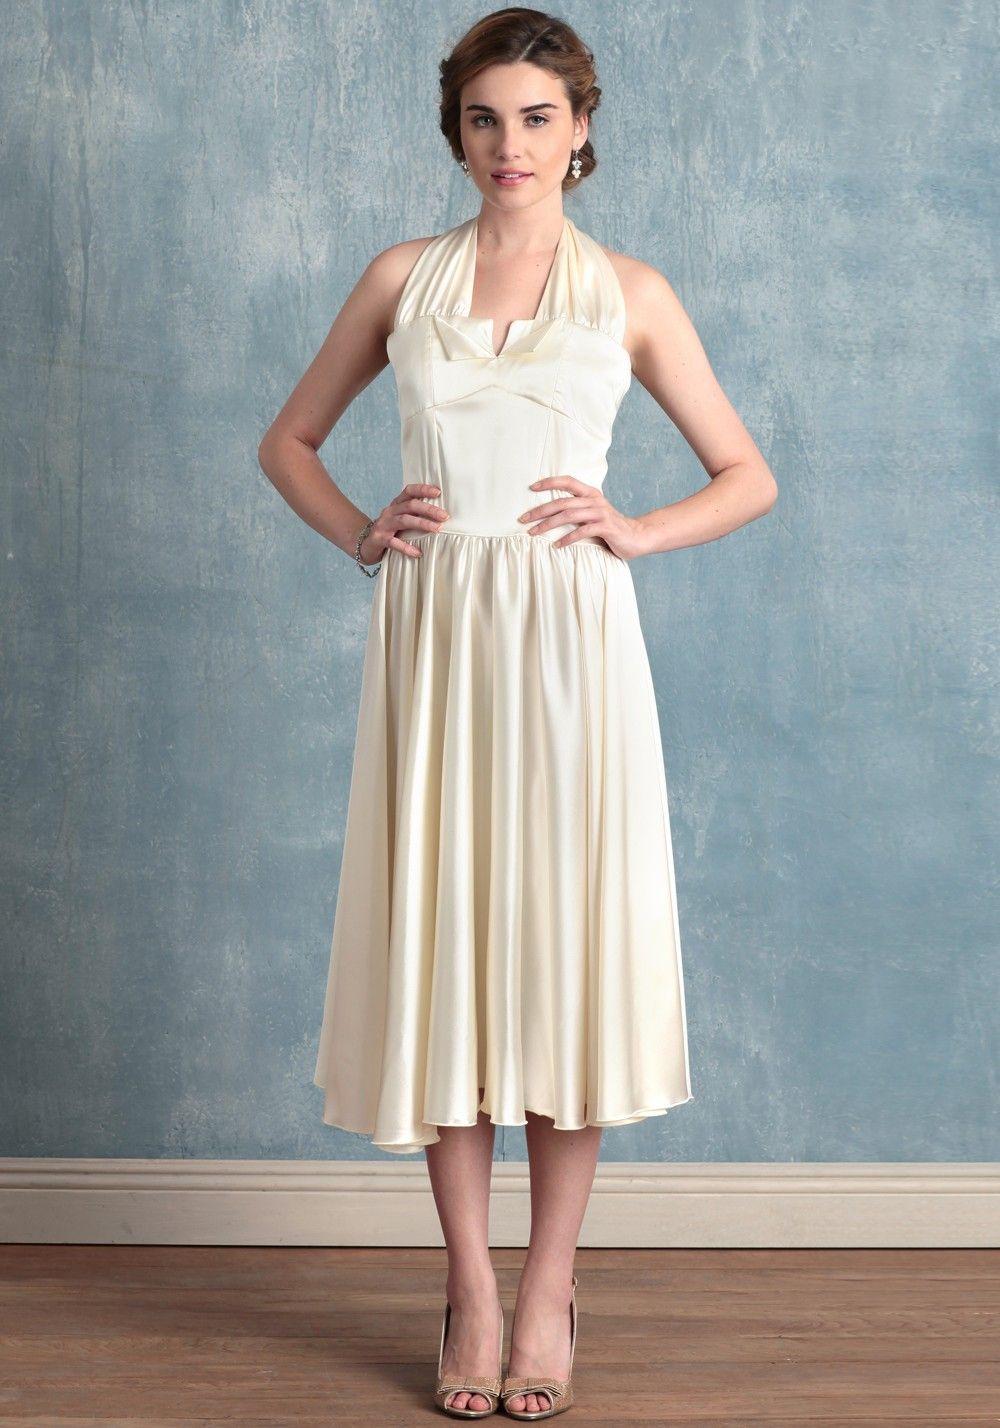 Mackenzie | Modern Vintage Bridal Dresses | Modern Vintage Bridal ...